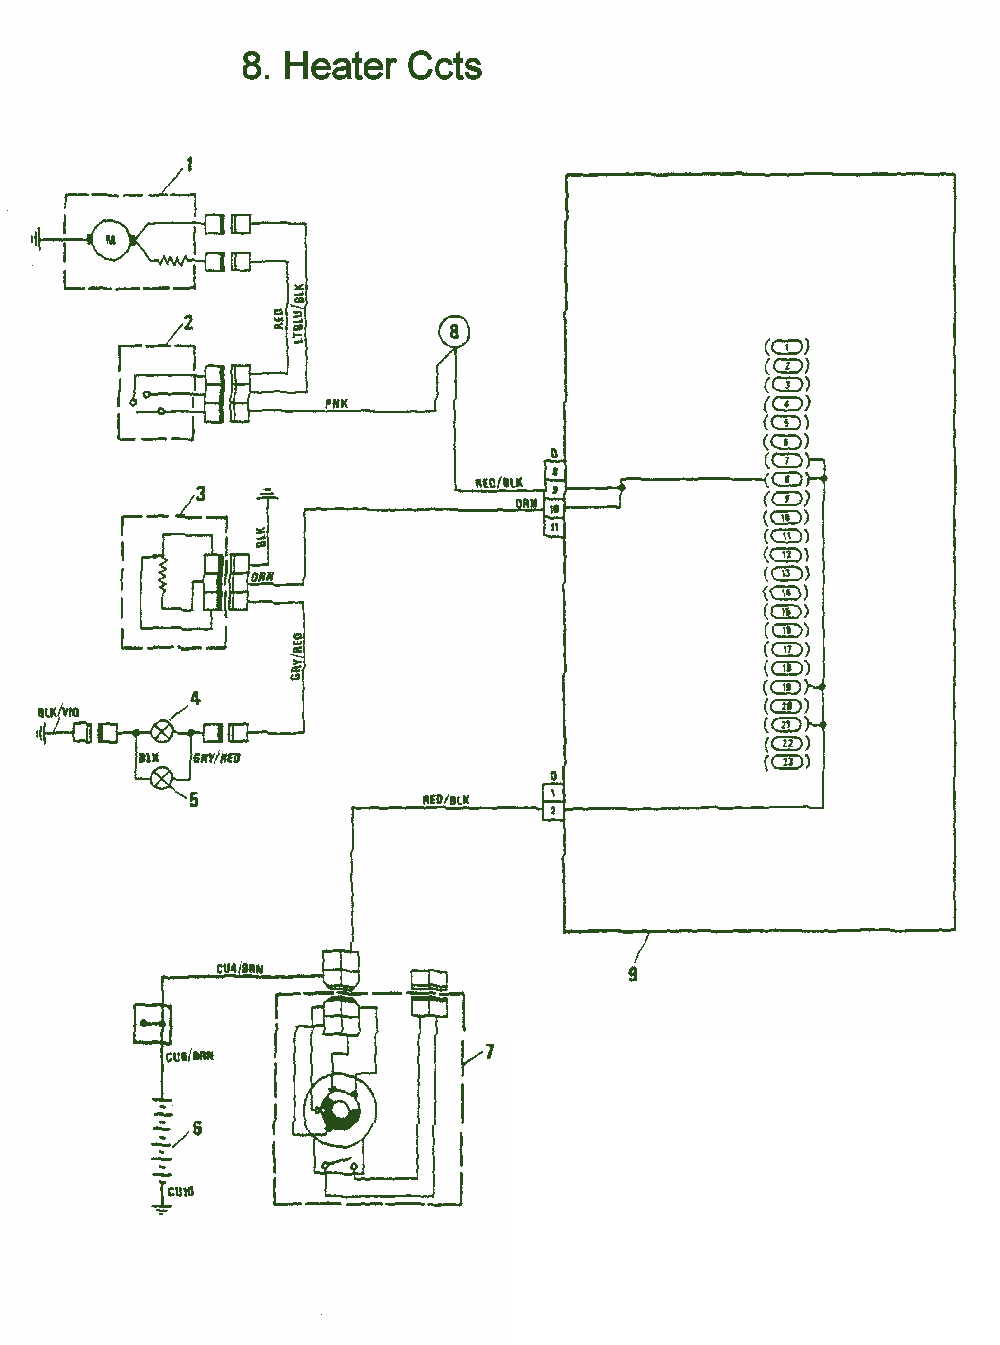 VW TDI Engine Heater Plug image details – Dodge Sprinter Booster Heater Wiring Diagram